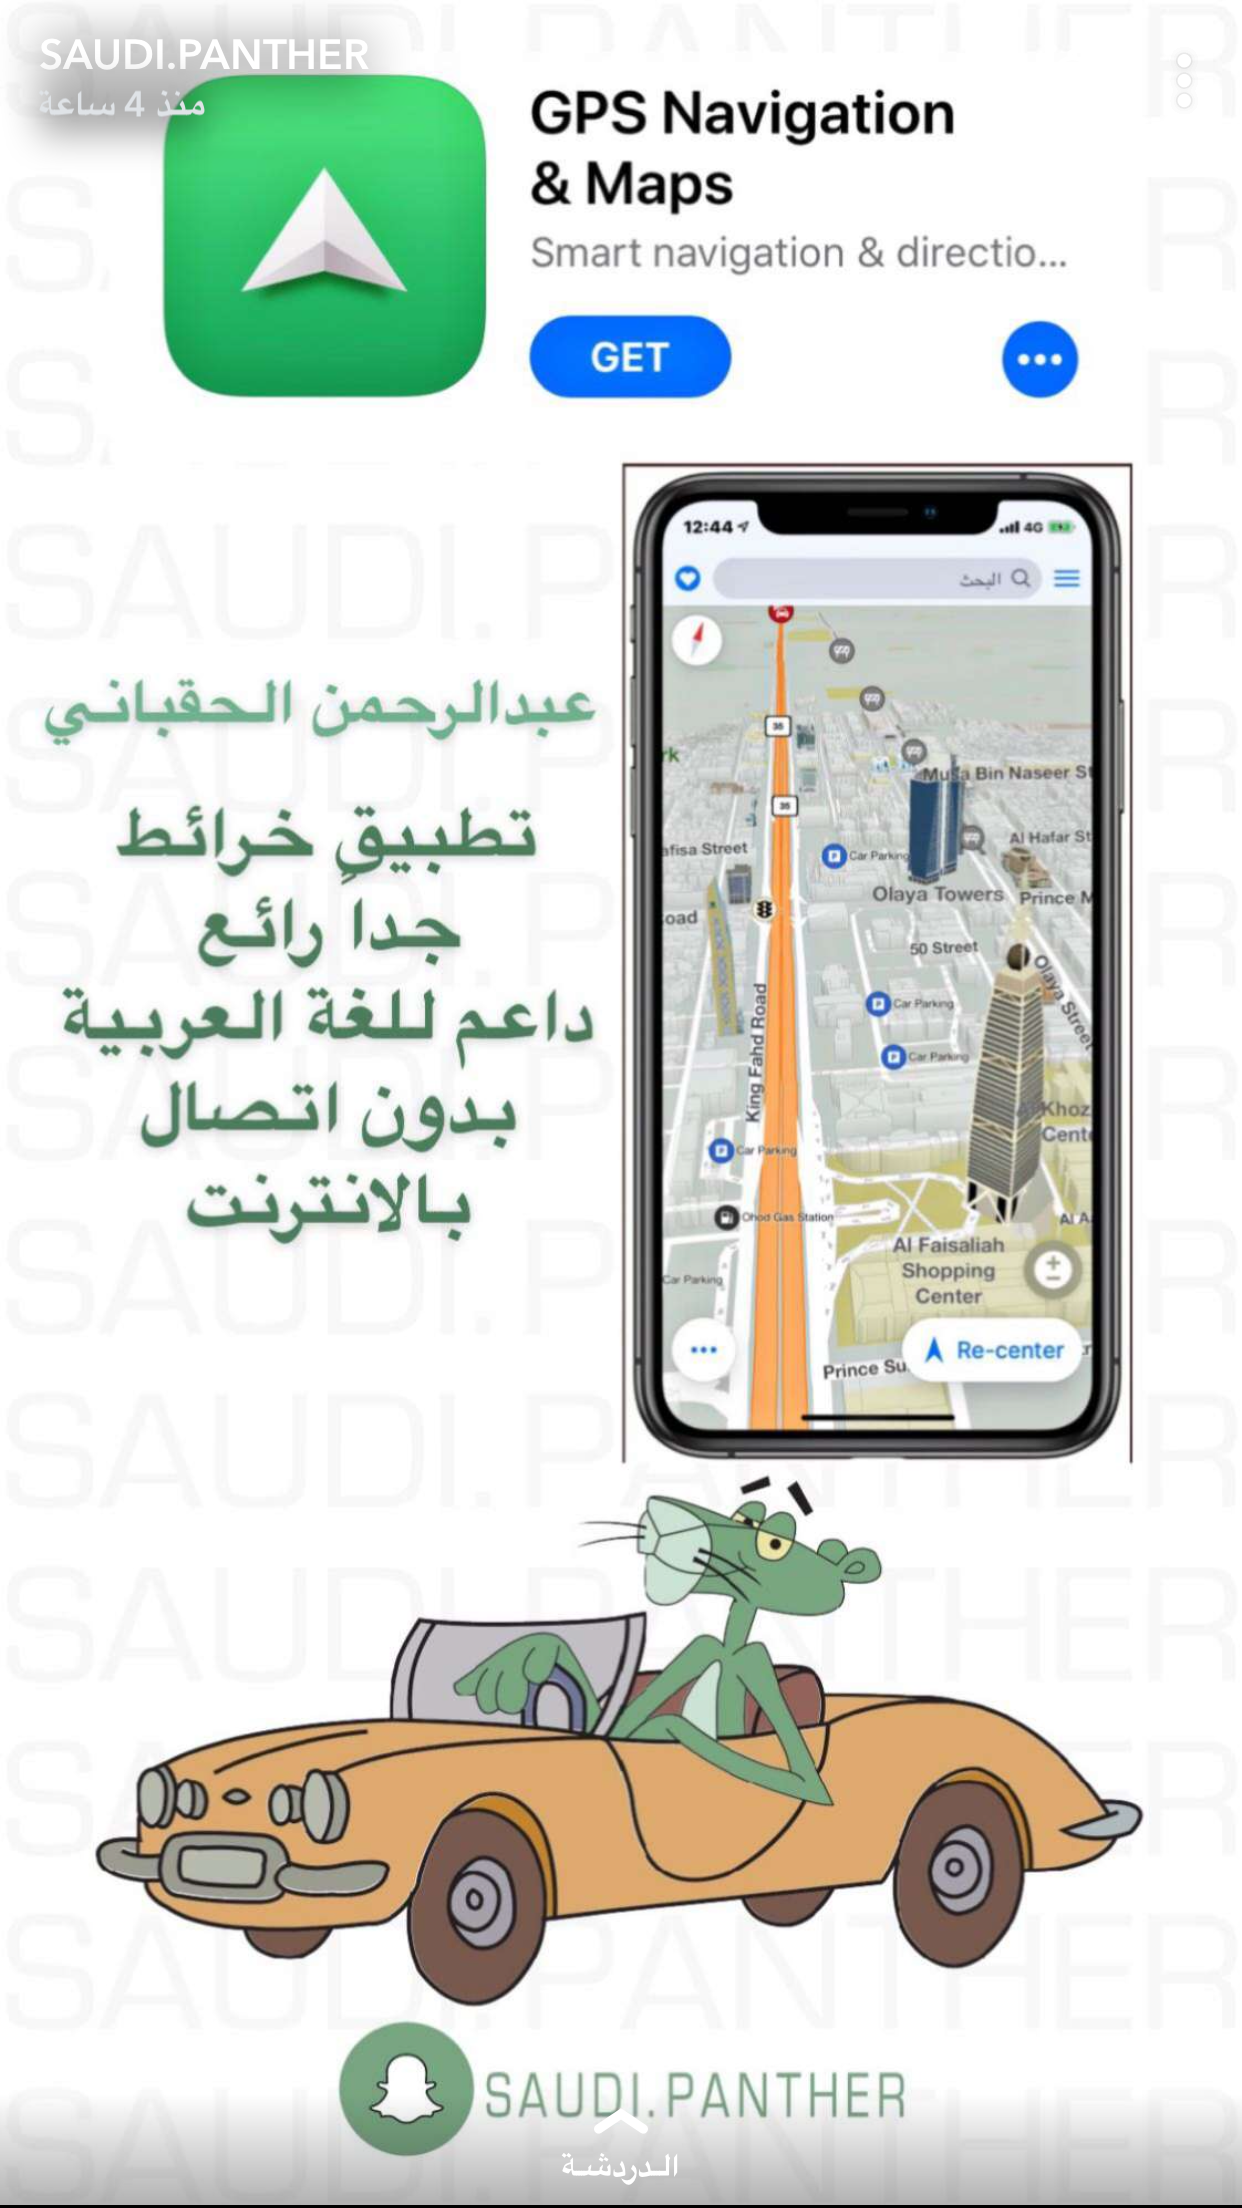 Pin by Manar Aljumaa on برامج Programming apps, Iphone